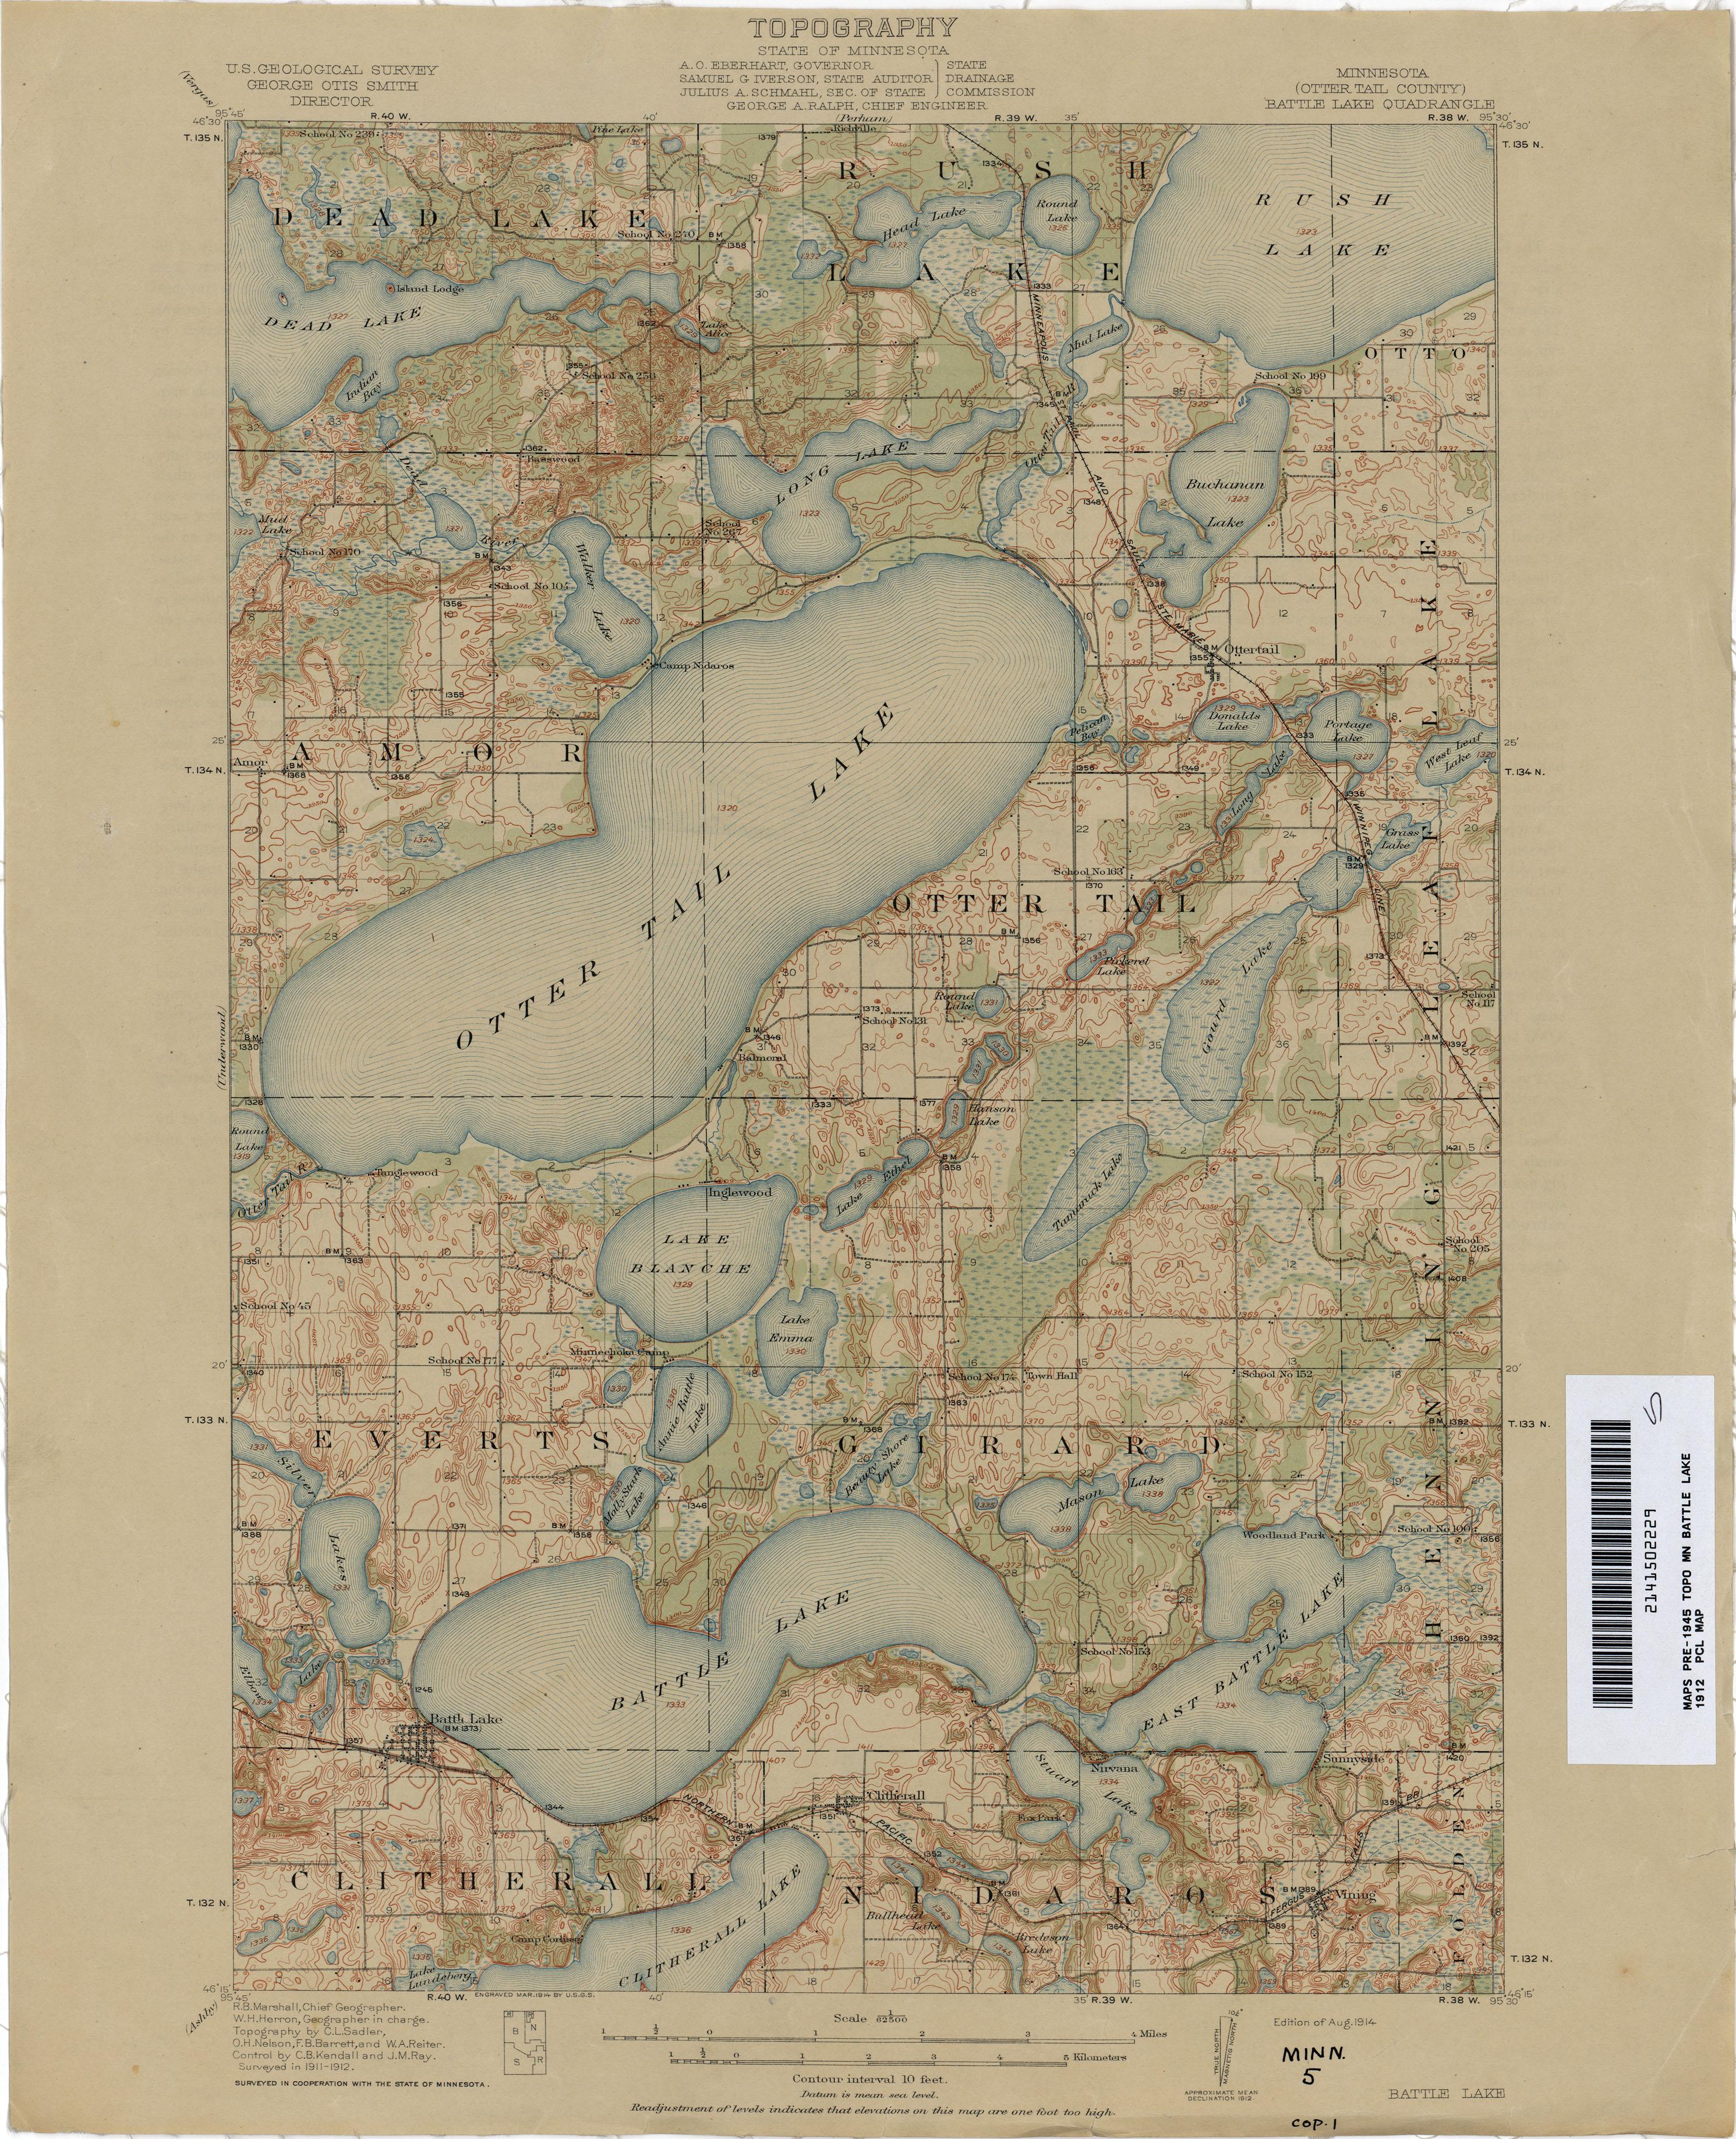 Minnesota Historical Topographic Maps PerryCastañeda Map - Minn map